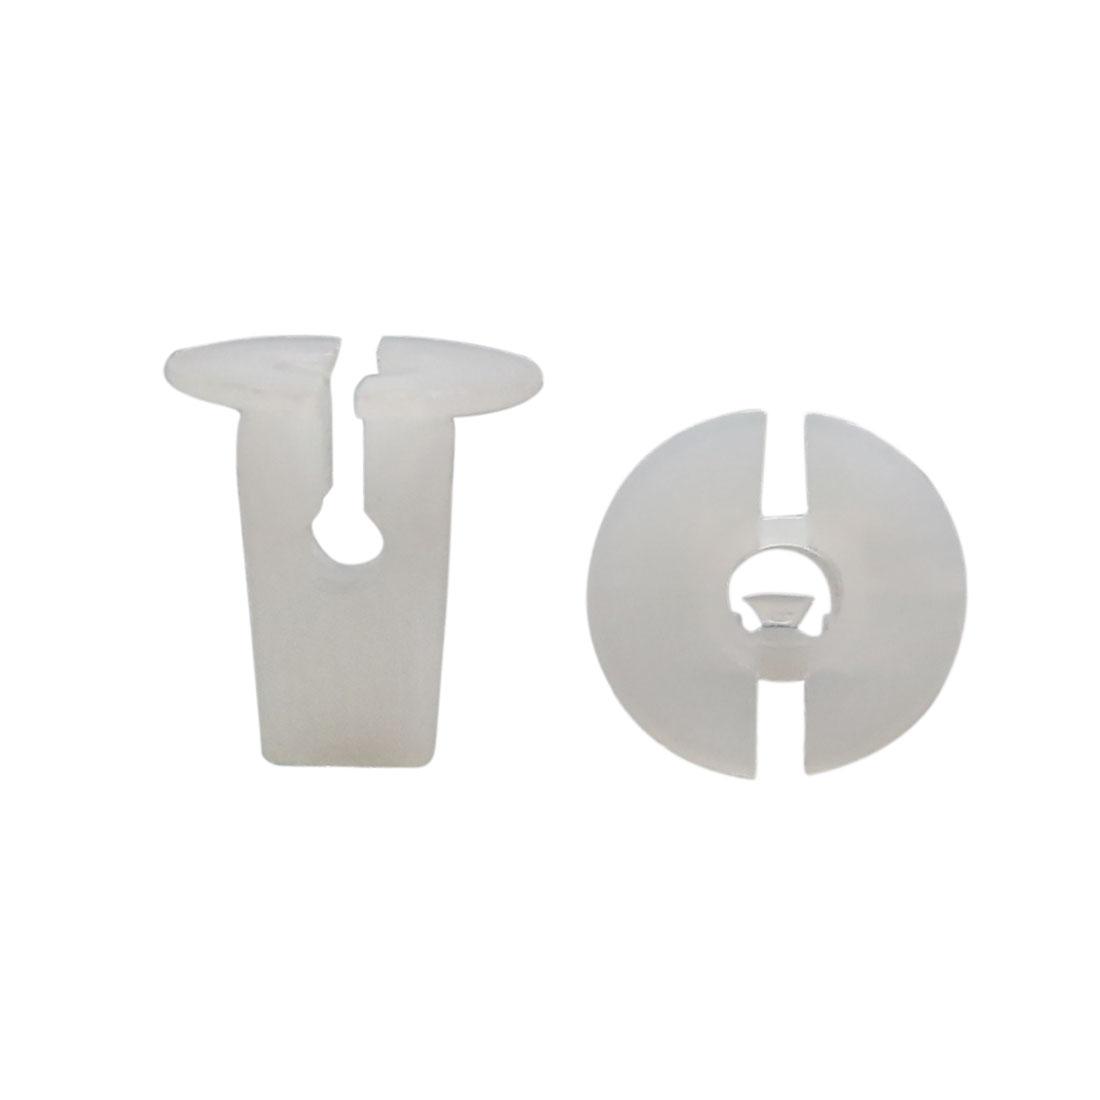 30Pcs White Plastic Rivet Push-Type Car Bumper Retainer Clips for 7 x 6mm Hole